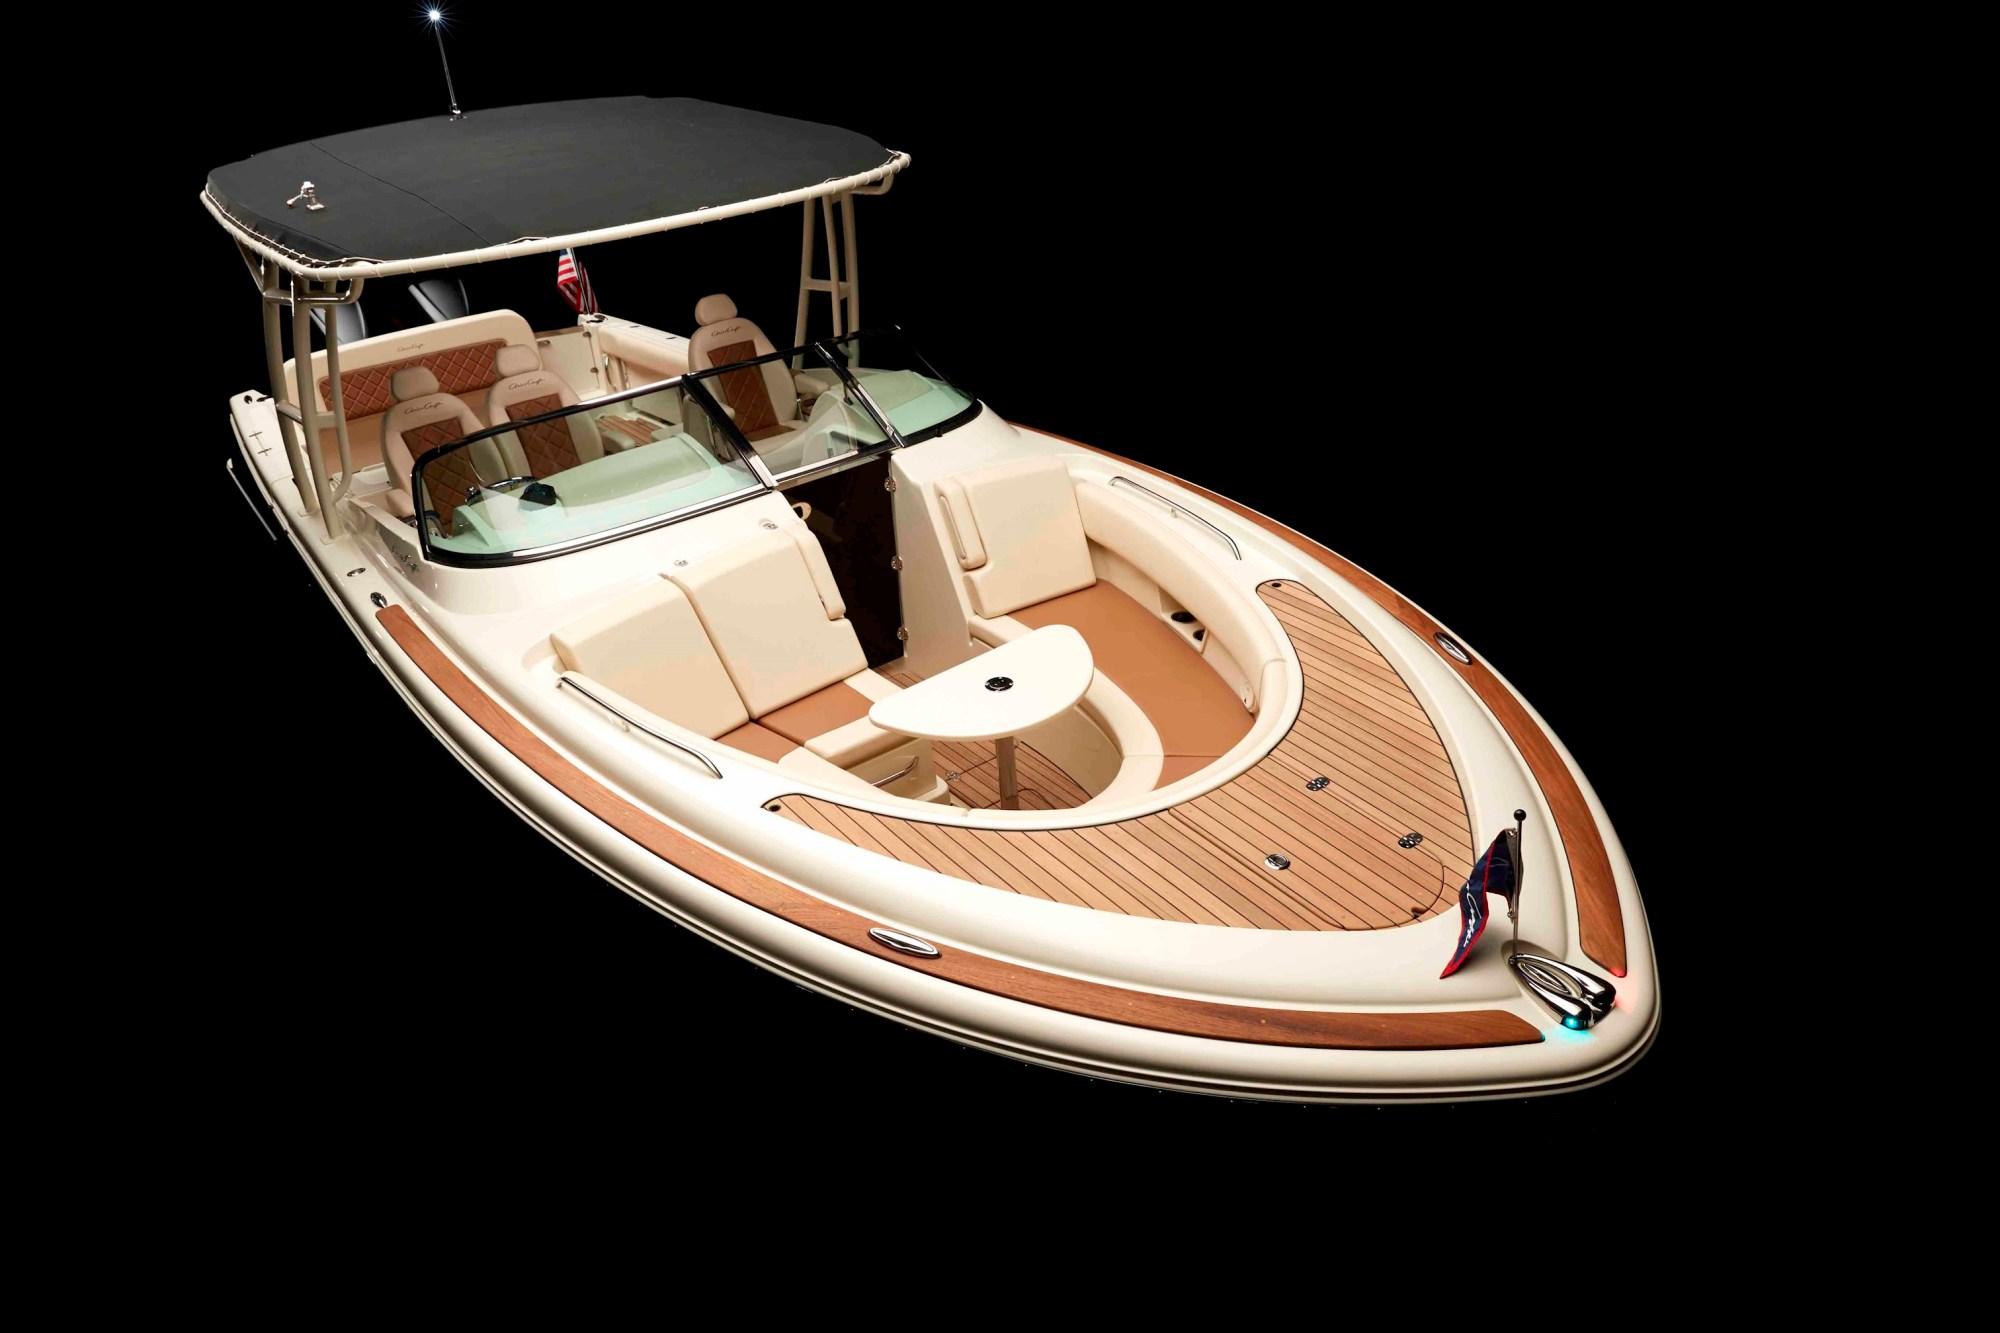 hight resolution of  chrysler boat wiring diagram on chrysler fuel diagrams dodge truck electrical diagrams chrysler engine